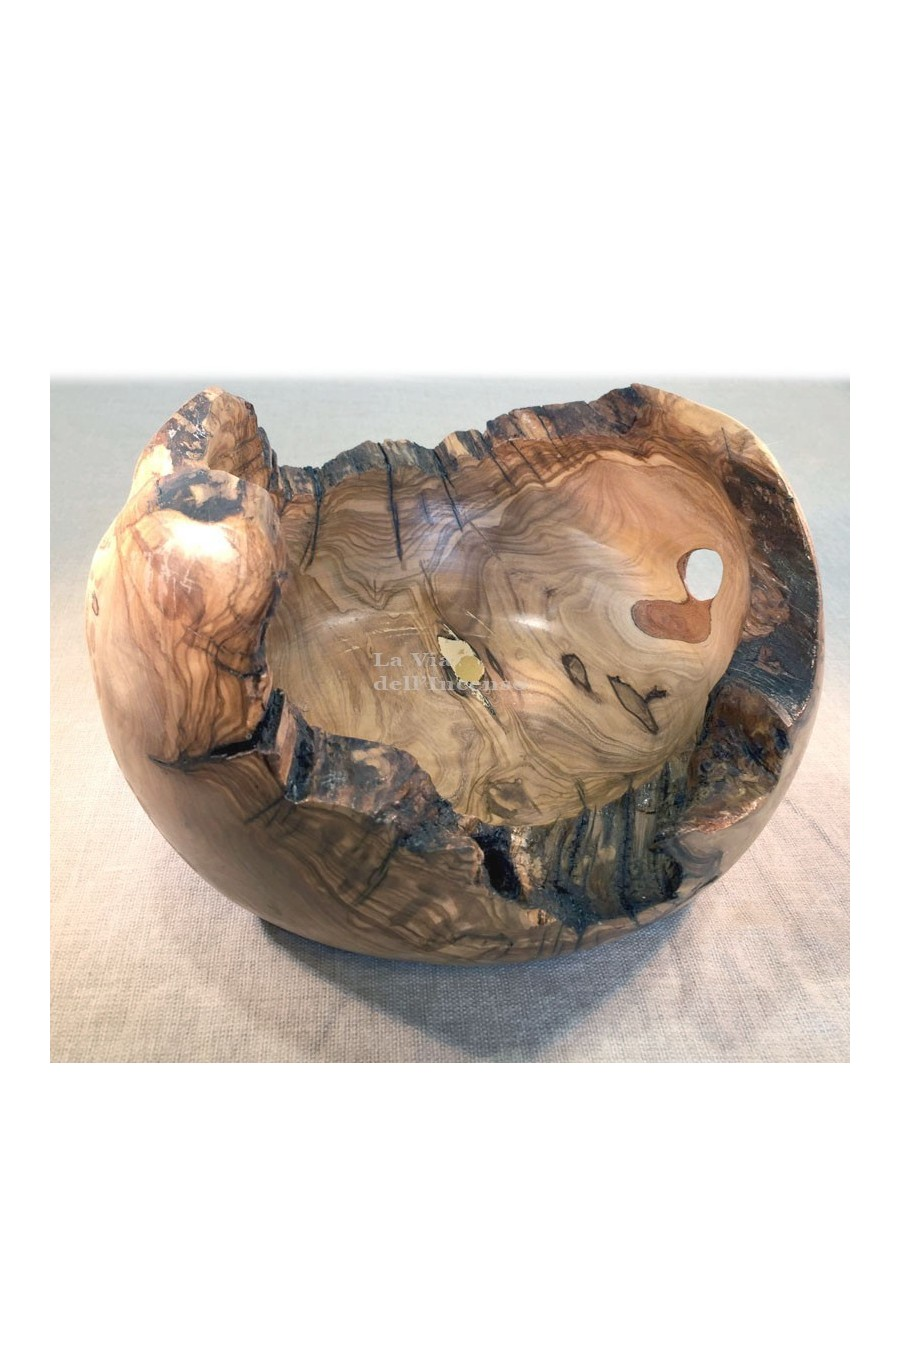 Svuotatasche in legno di olivo